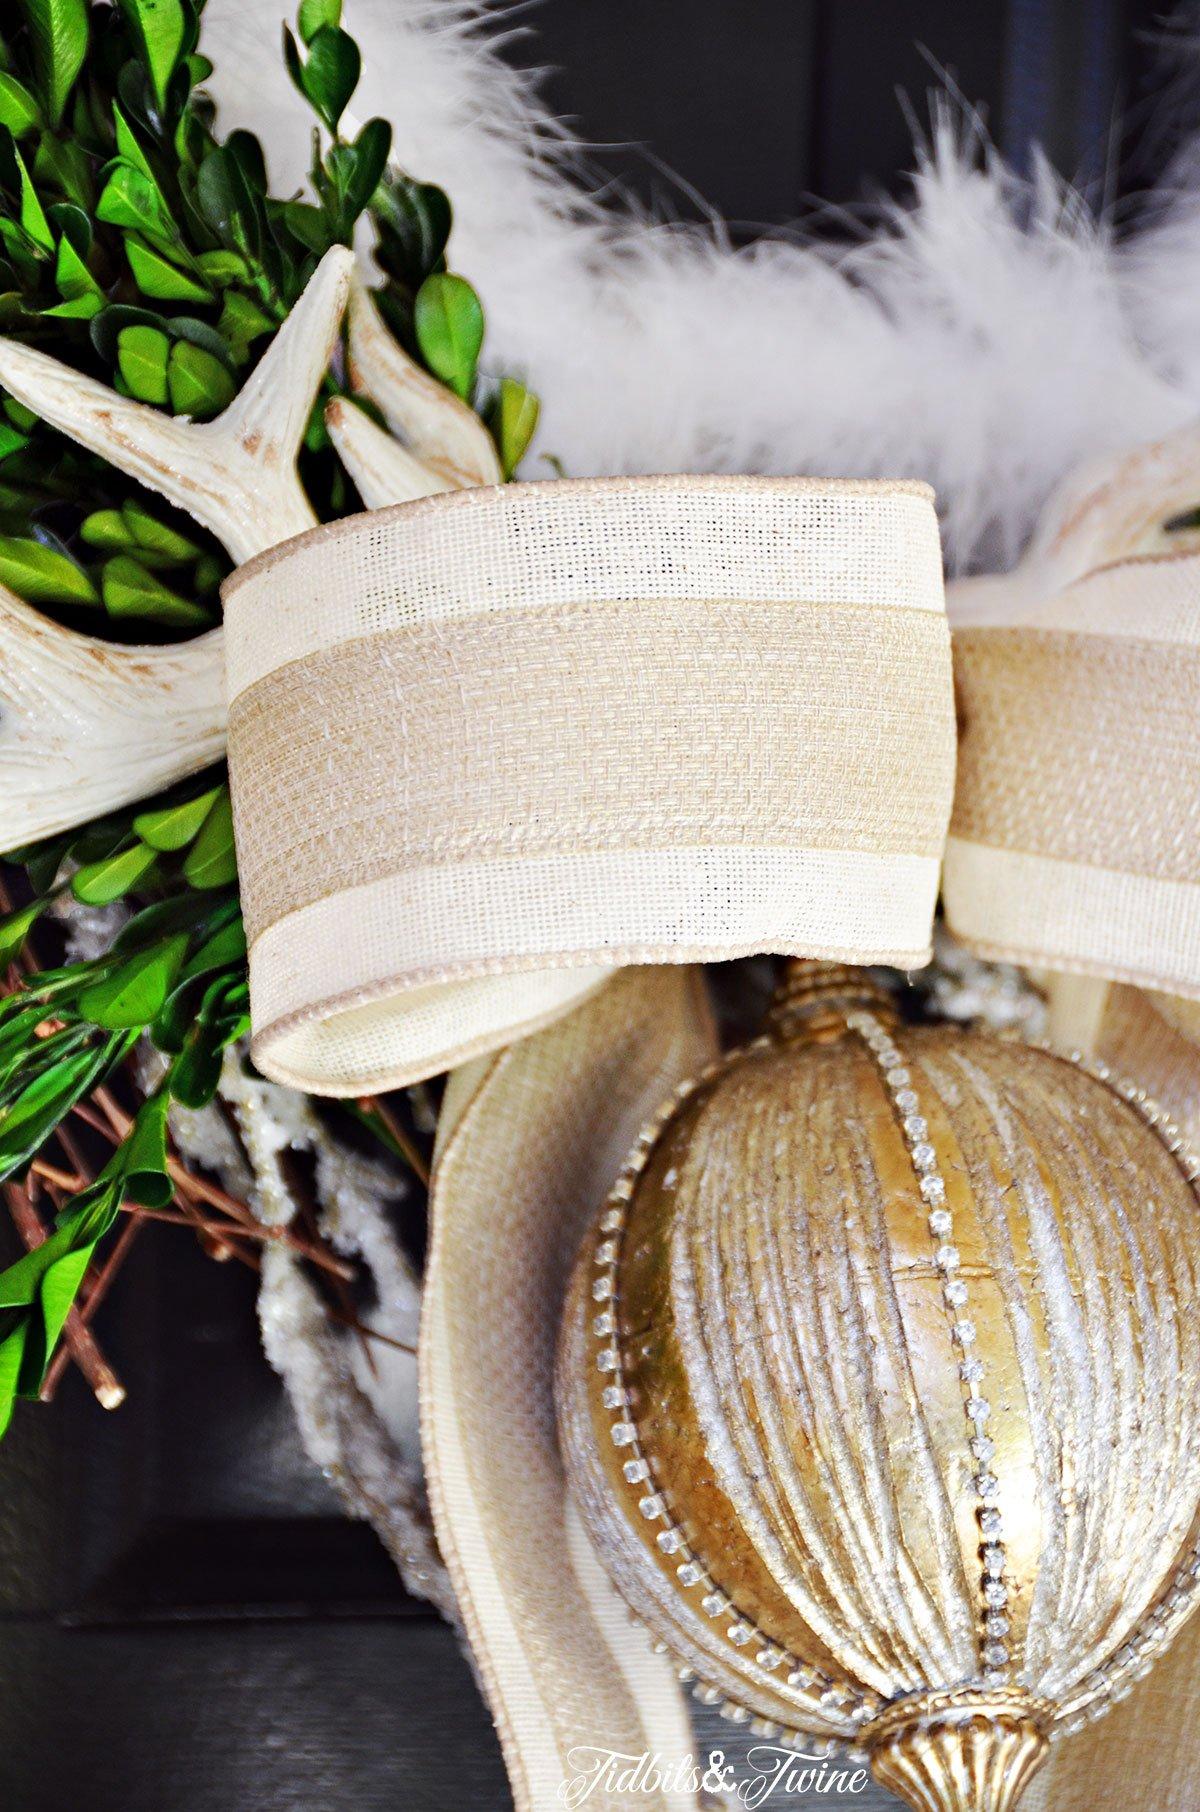 TIDBITS-&-TWINE---DIY-Christmas-Wreath-Ornament